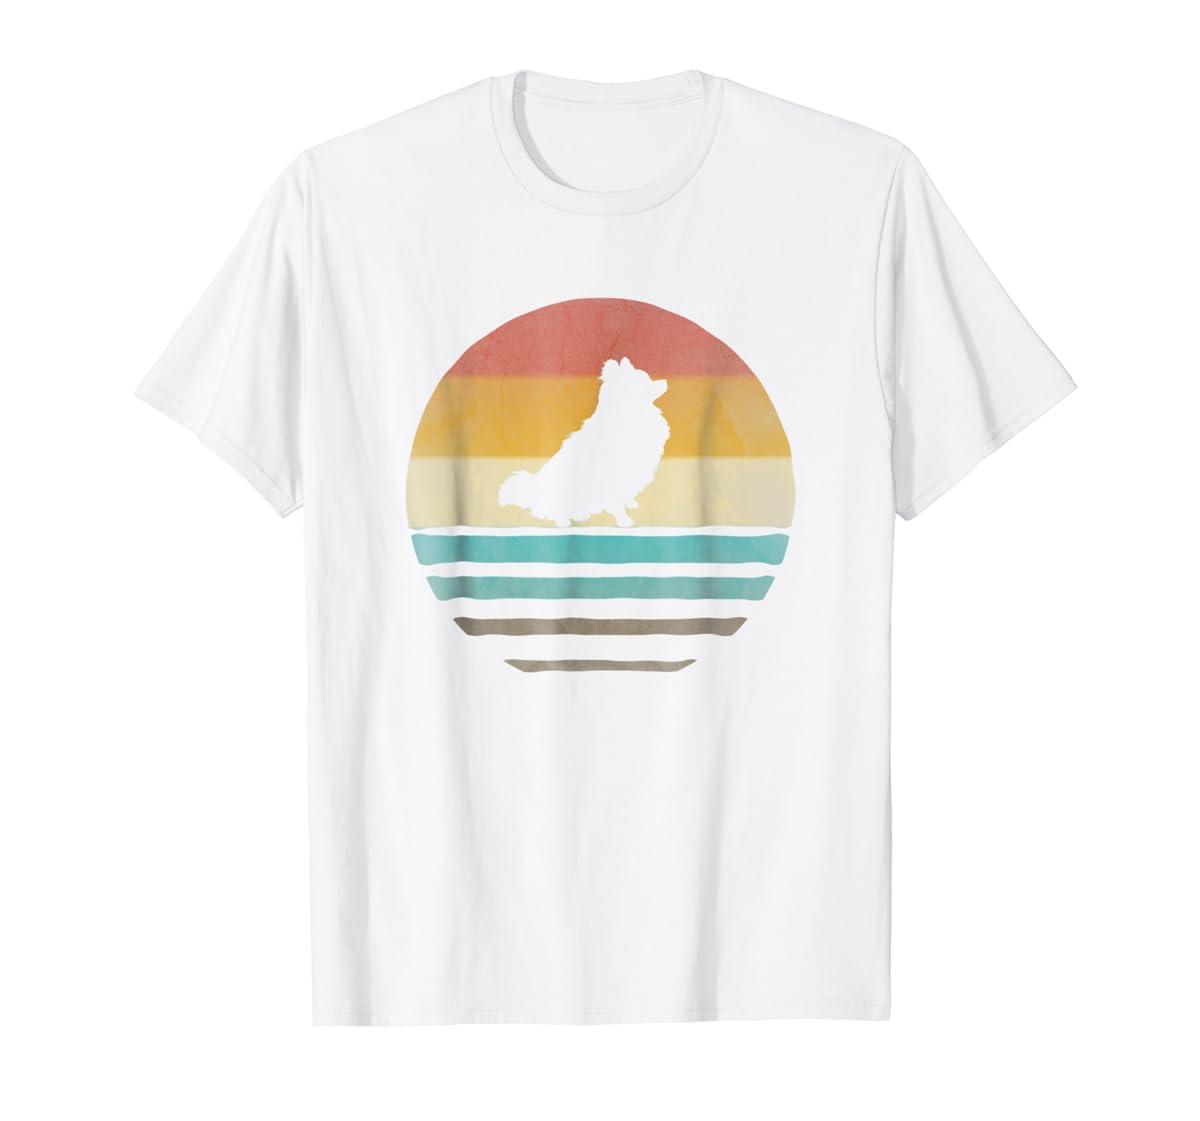 Pomeranian Dog Shirt Retro Vintage 70s Silhouette Distressed-Men's T-Shirt-White